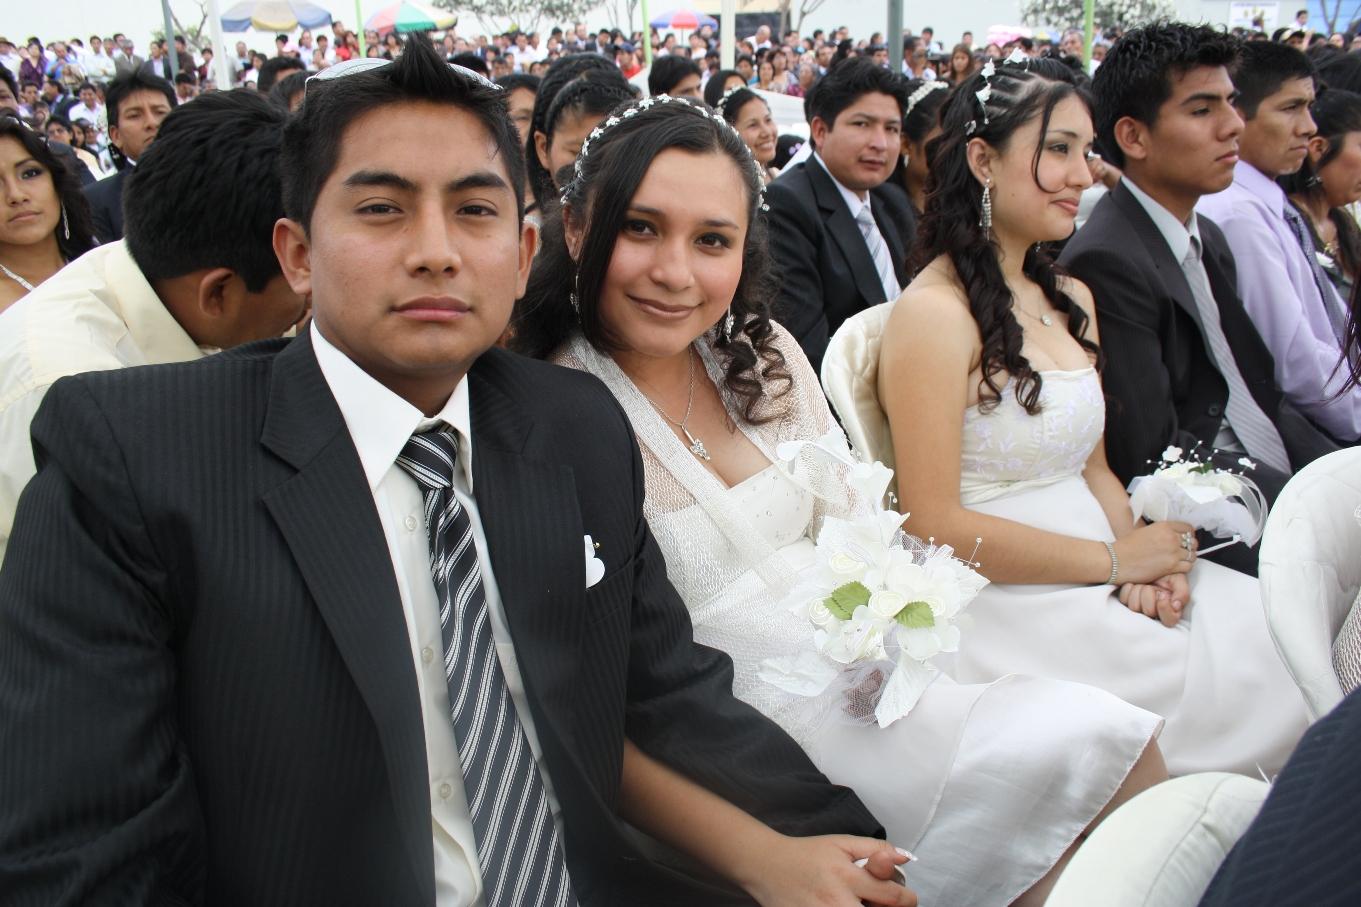 Matrimonio Simbolico En Peru : Post sanvalentín así están las cifras del matrimonio en